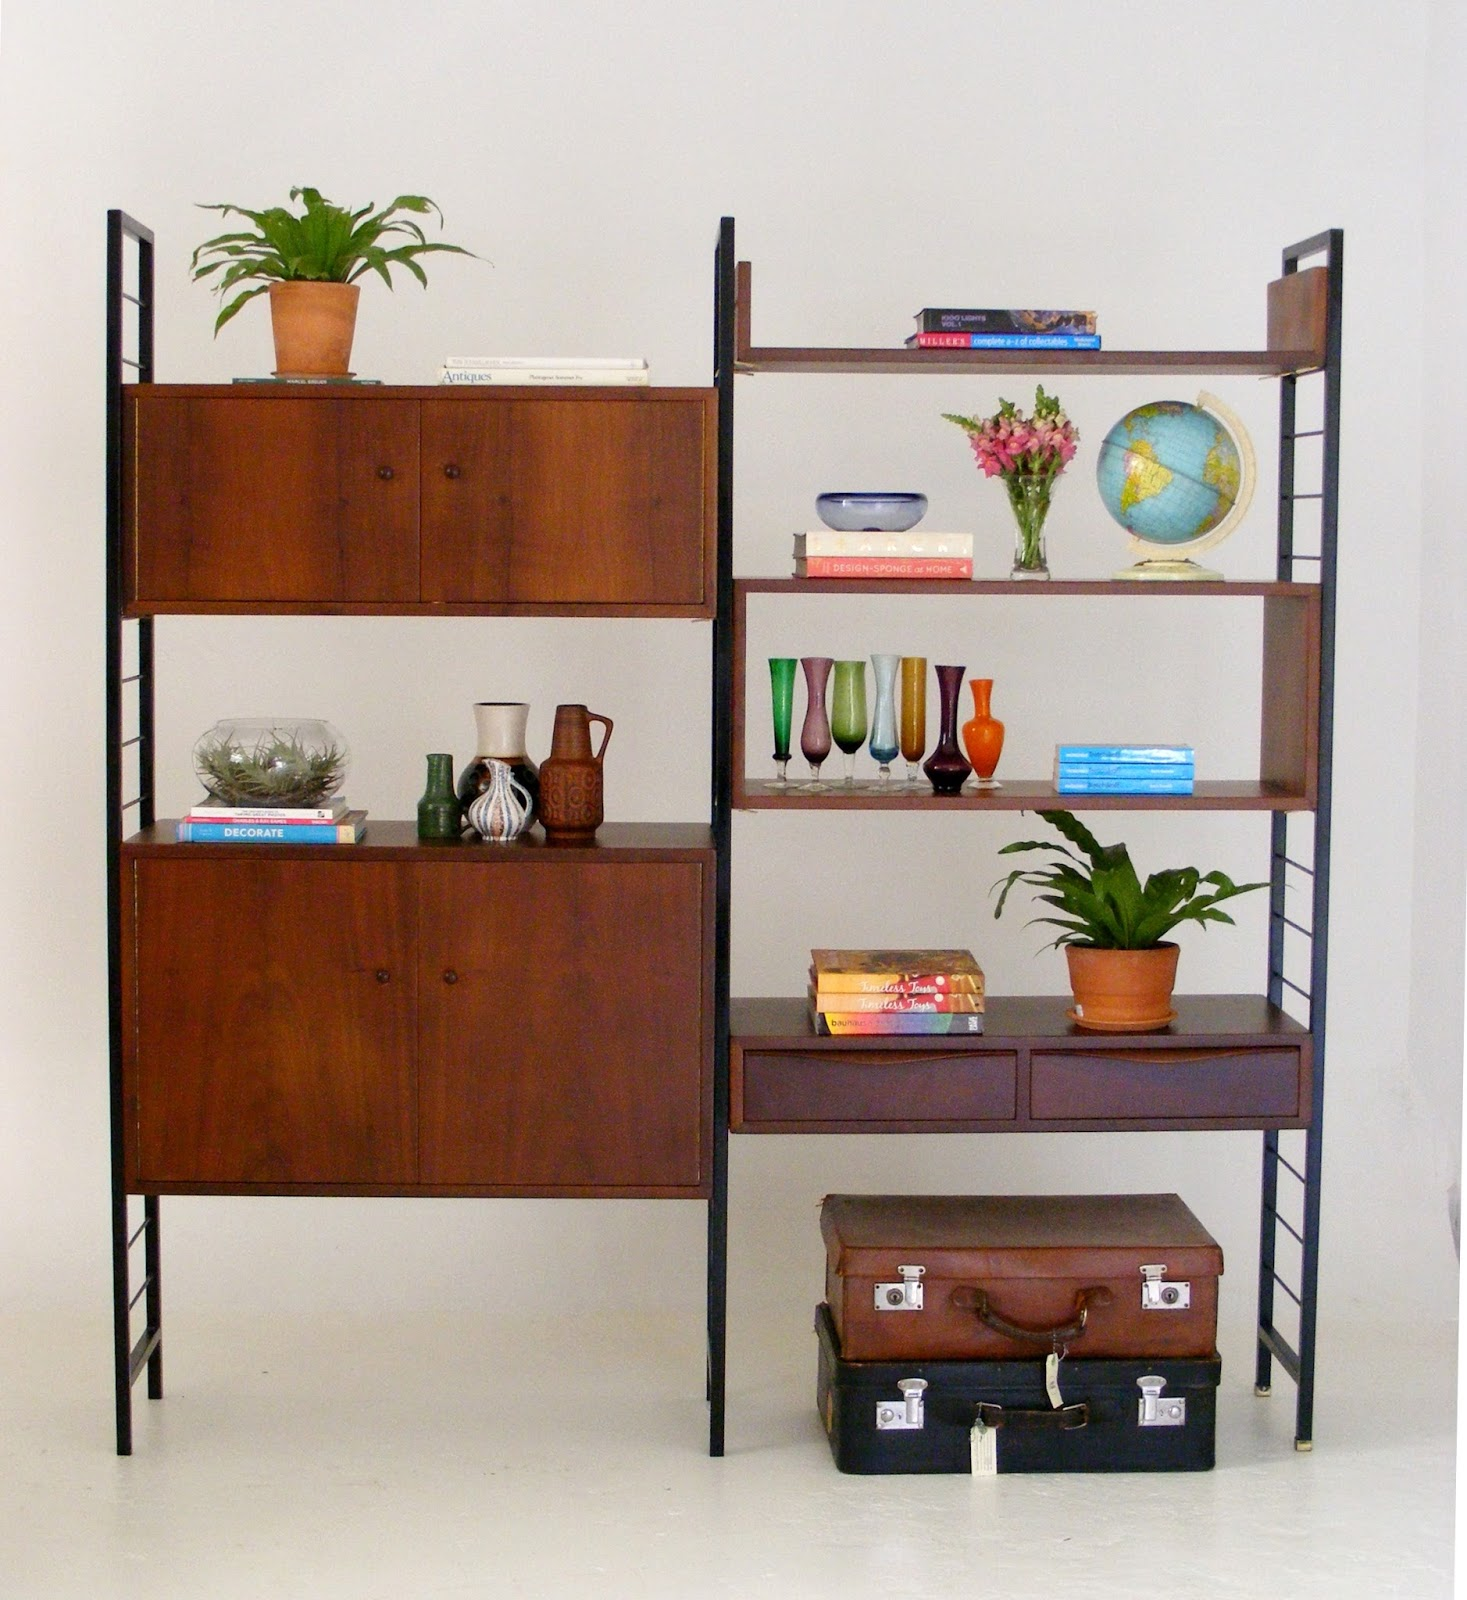 VAMP FURNITURE: New vintage furniture stock just unpacked at Vamp ...